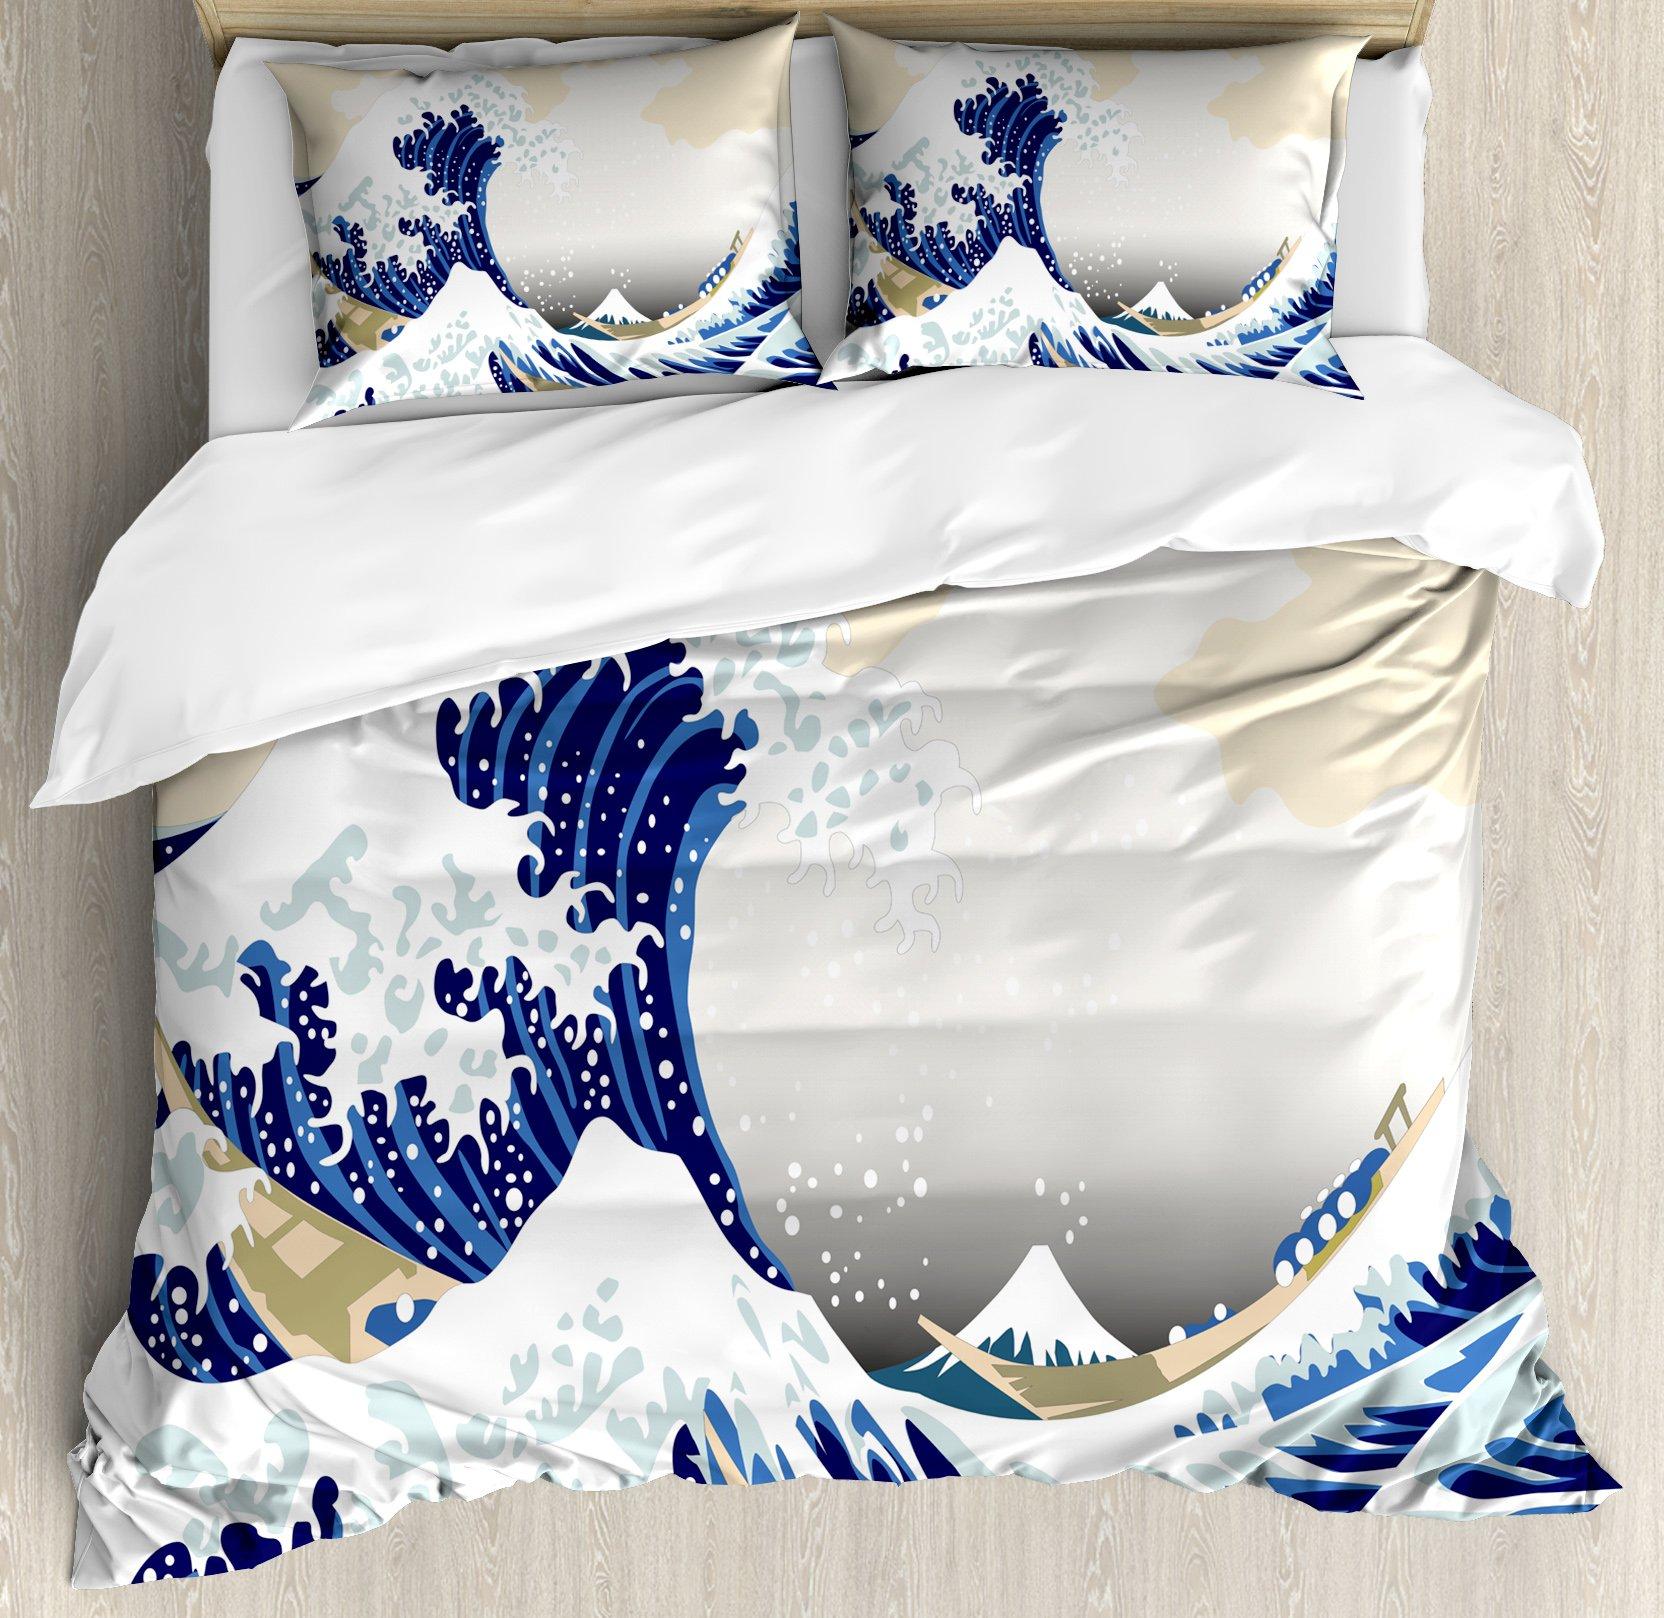 Lunarable Wave Duvet Cover Set Queen Size, Hokusai Pattern Japanese Ukiyoe Themed Asian Oriental Sketch Style Ocean, Decorative 3 Piece Bedding Set with 2 Pillow Shams, Navy Blue Beige White